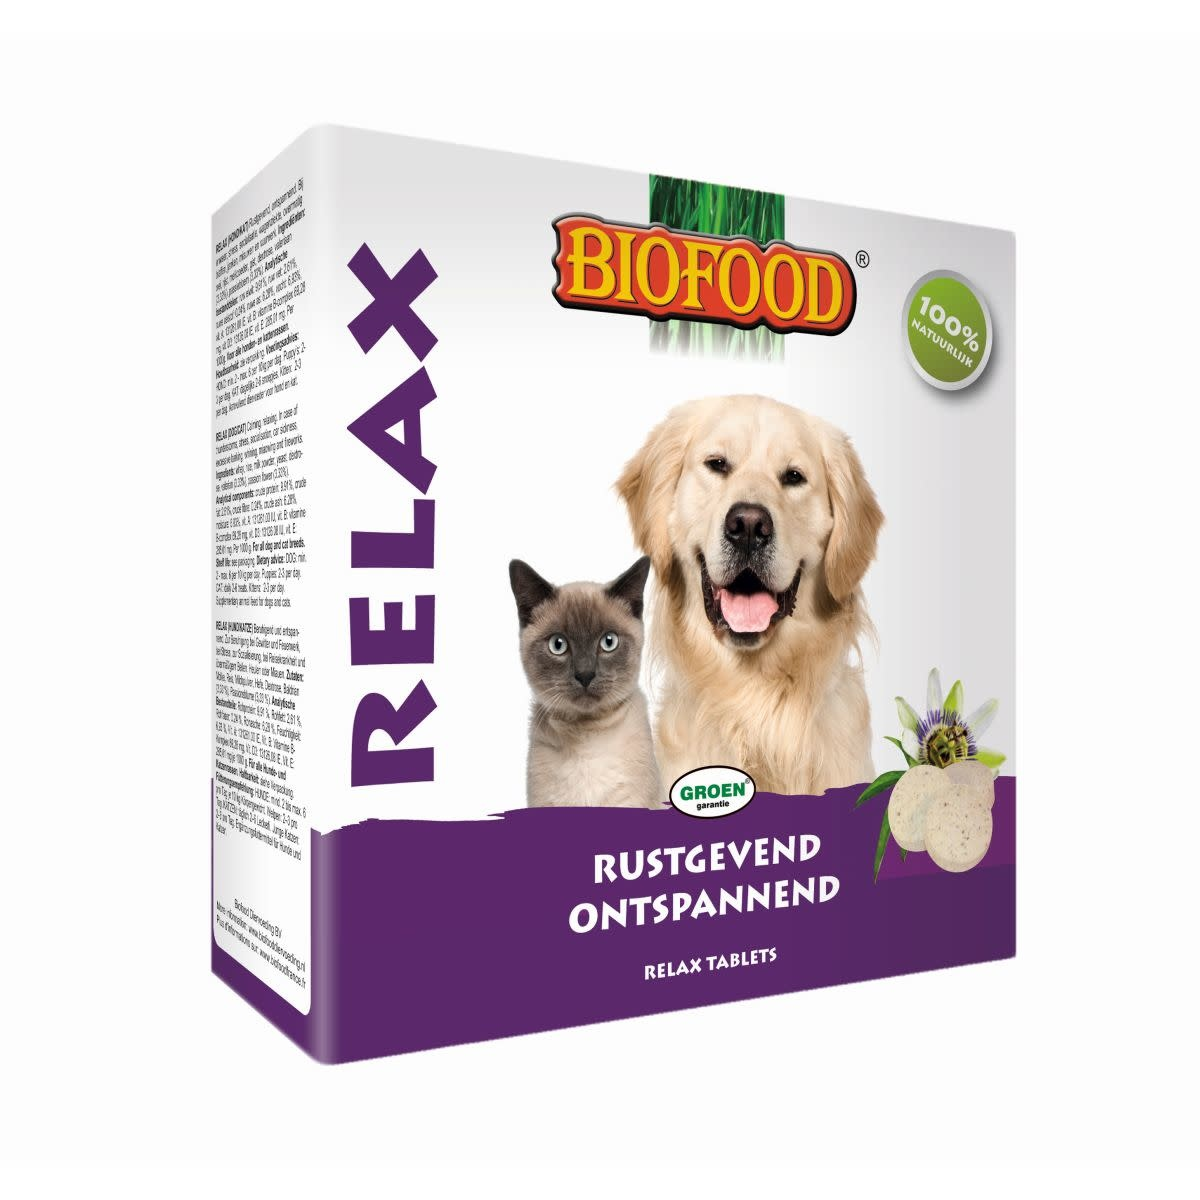 BioFood Biofood relax 60g